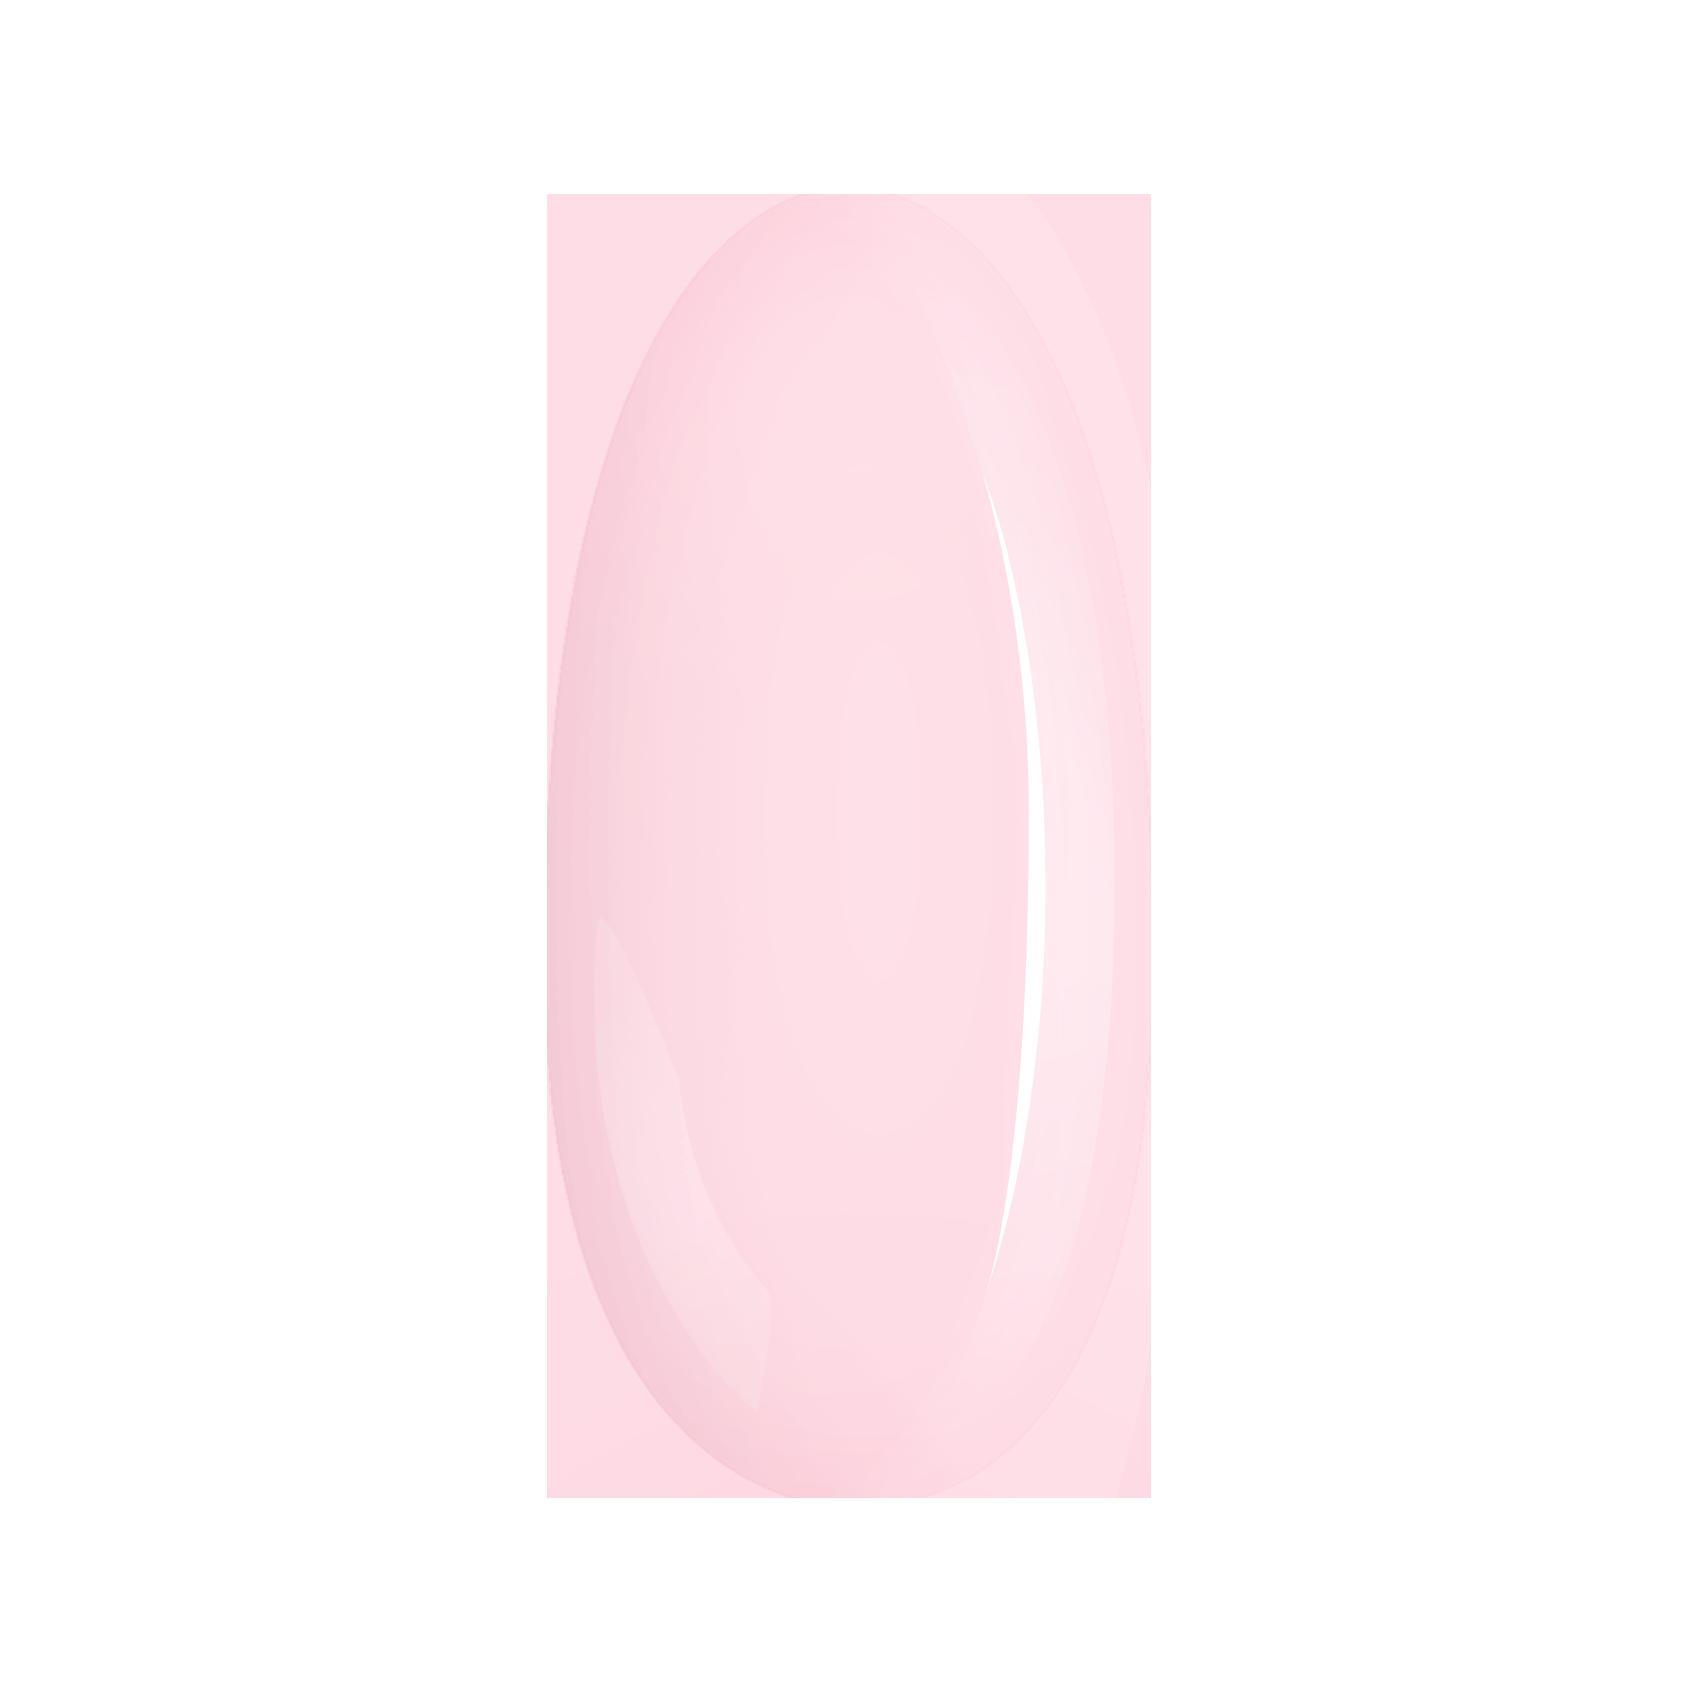 Gelio lako bazė 7,2 ml – Revital Fiber Rosy Blush